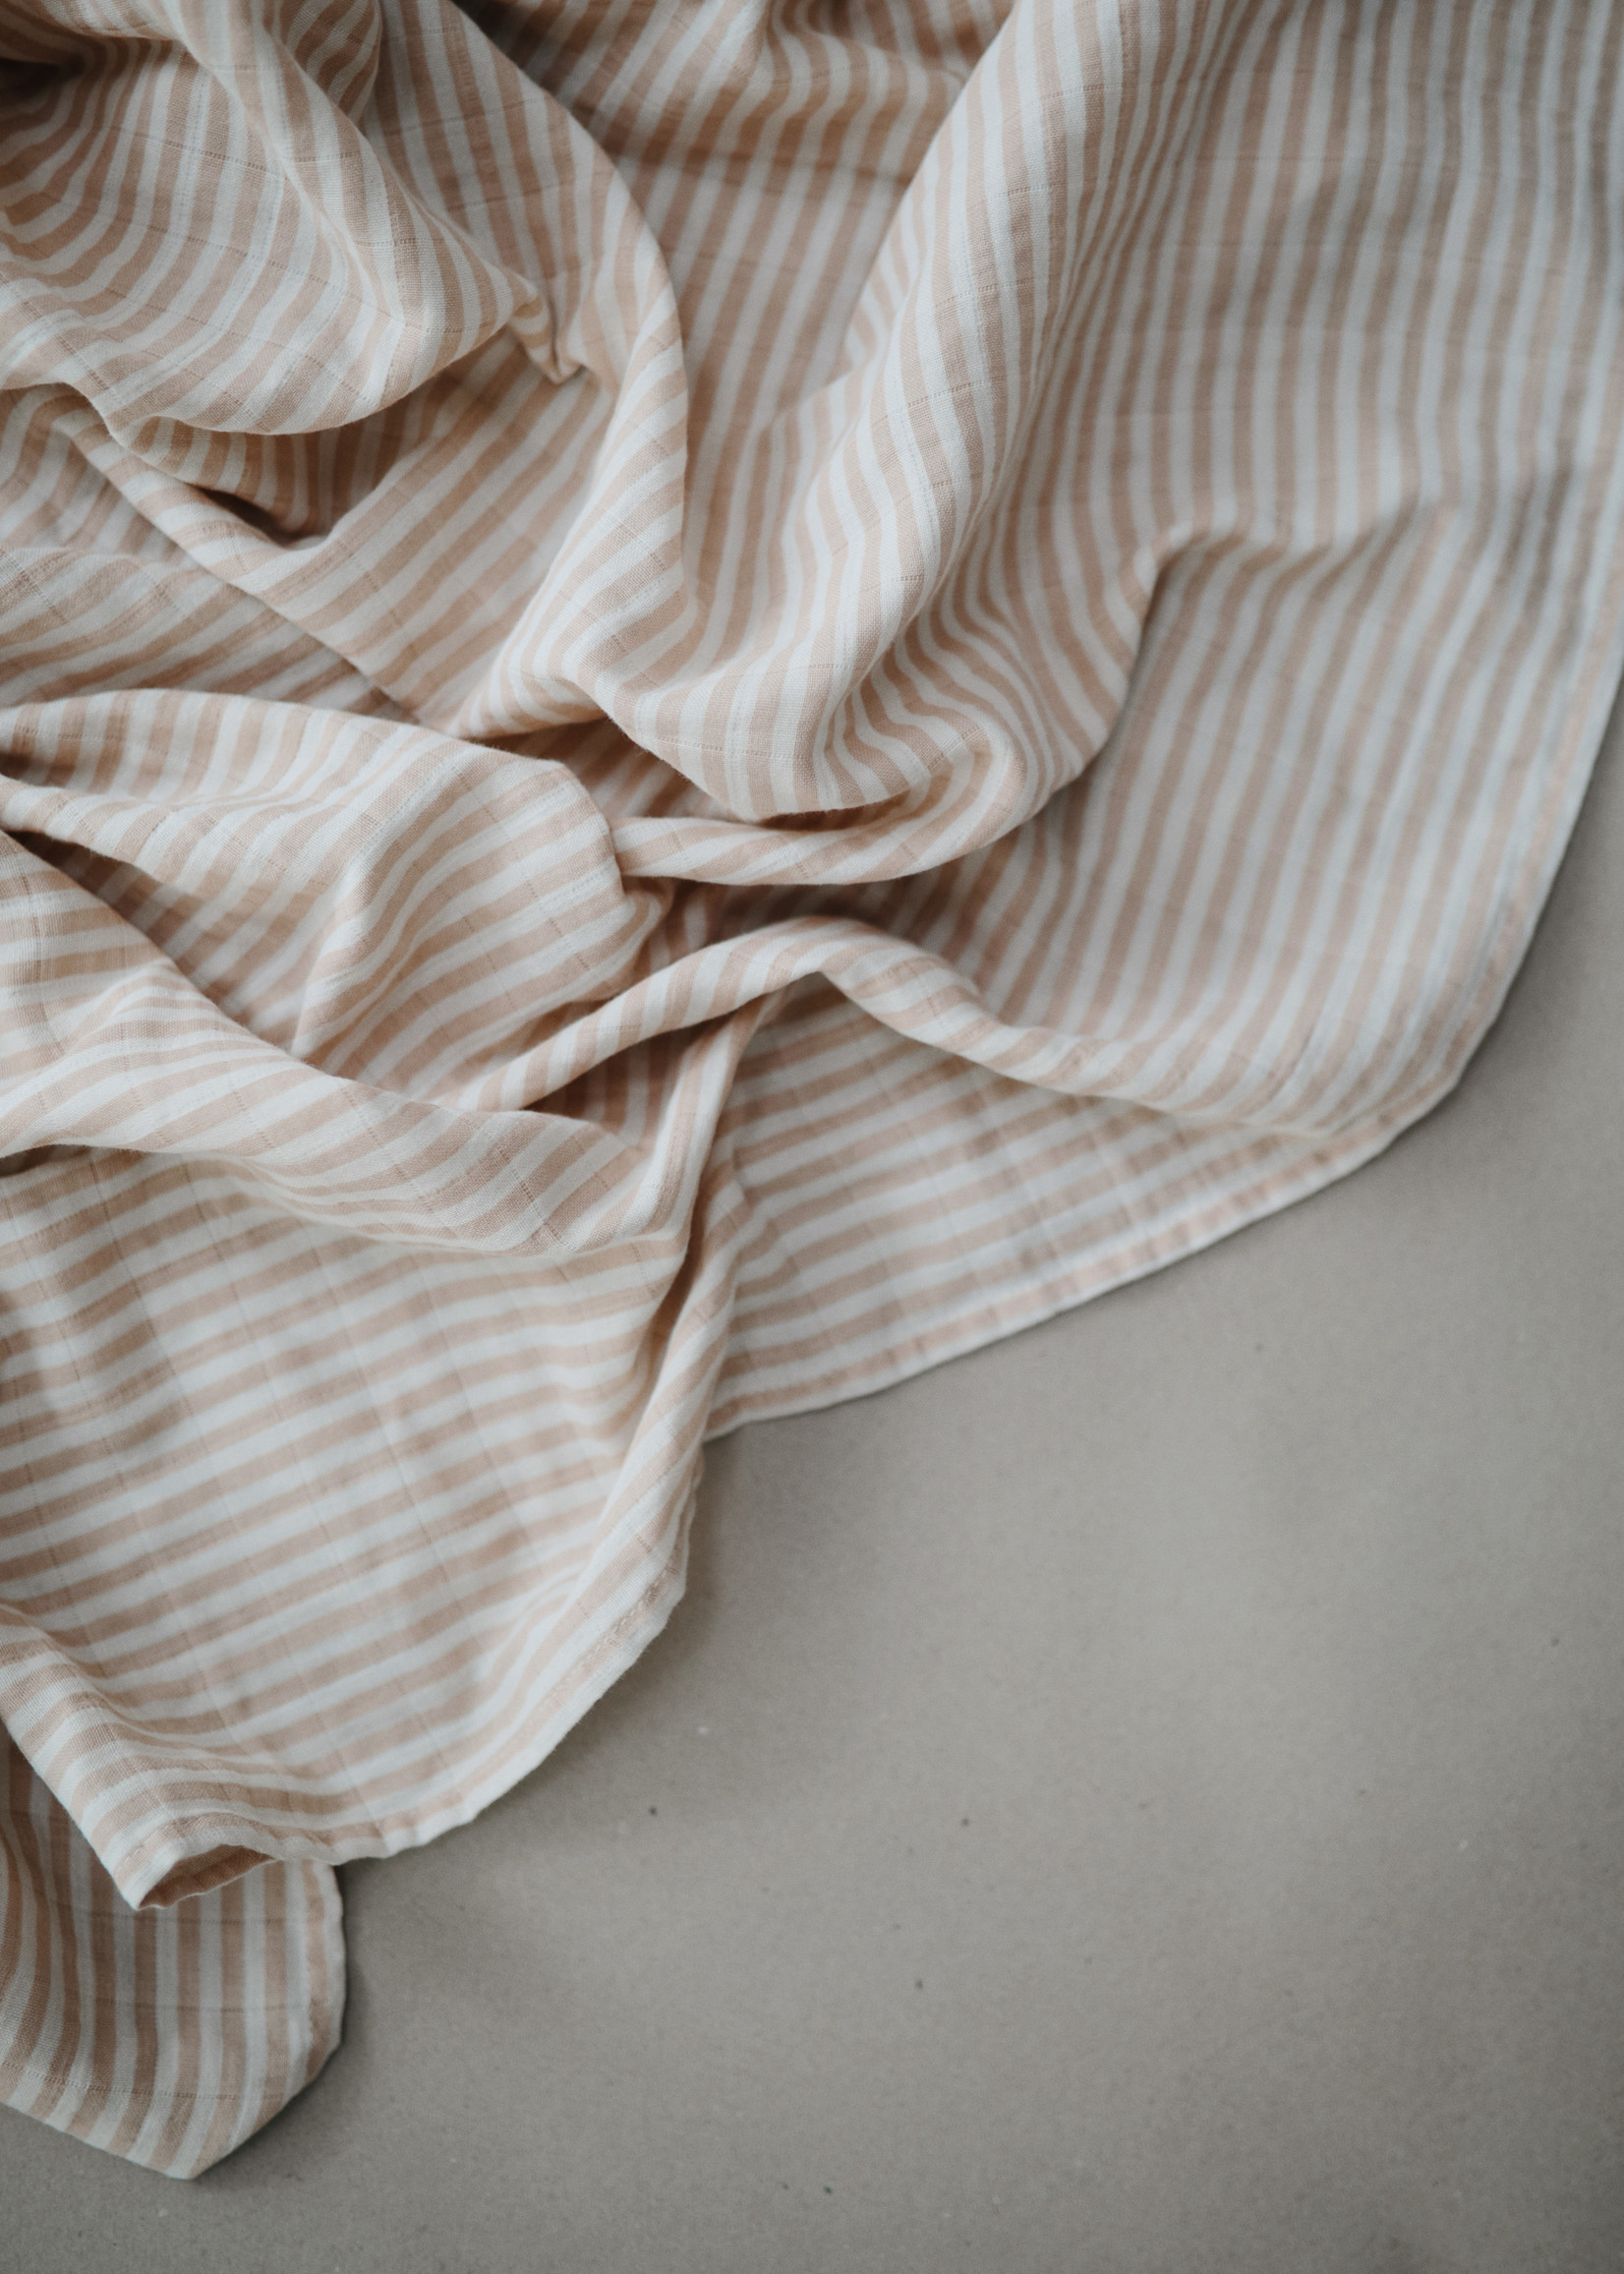 Mushie Muslin Swaddle Blanket Organic Cotton - Natural Stripes